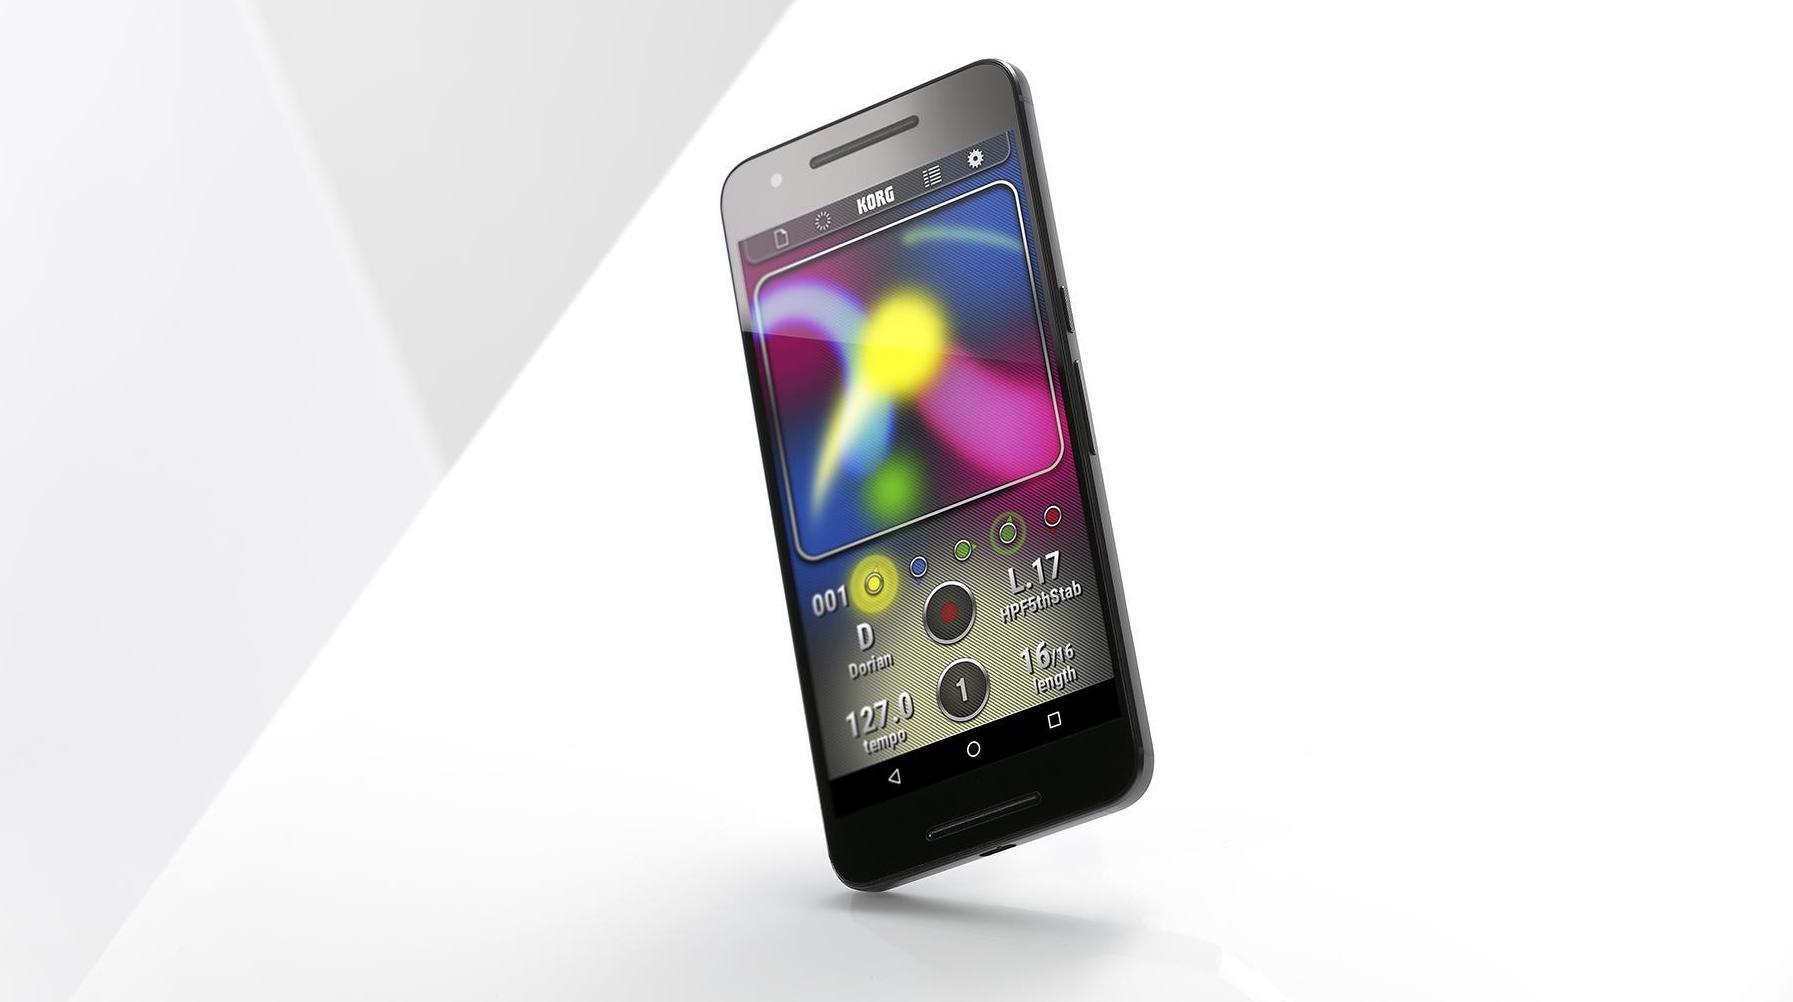 KORG Kaossilator social distancing app deals